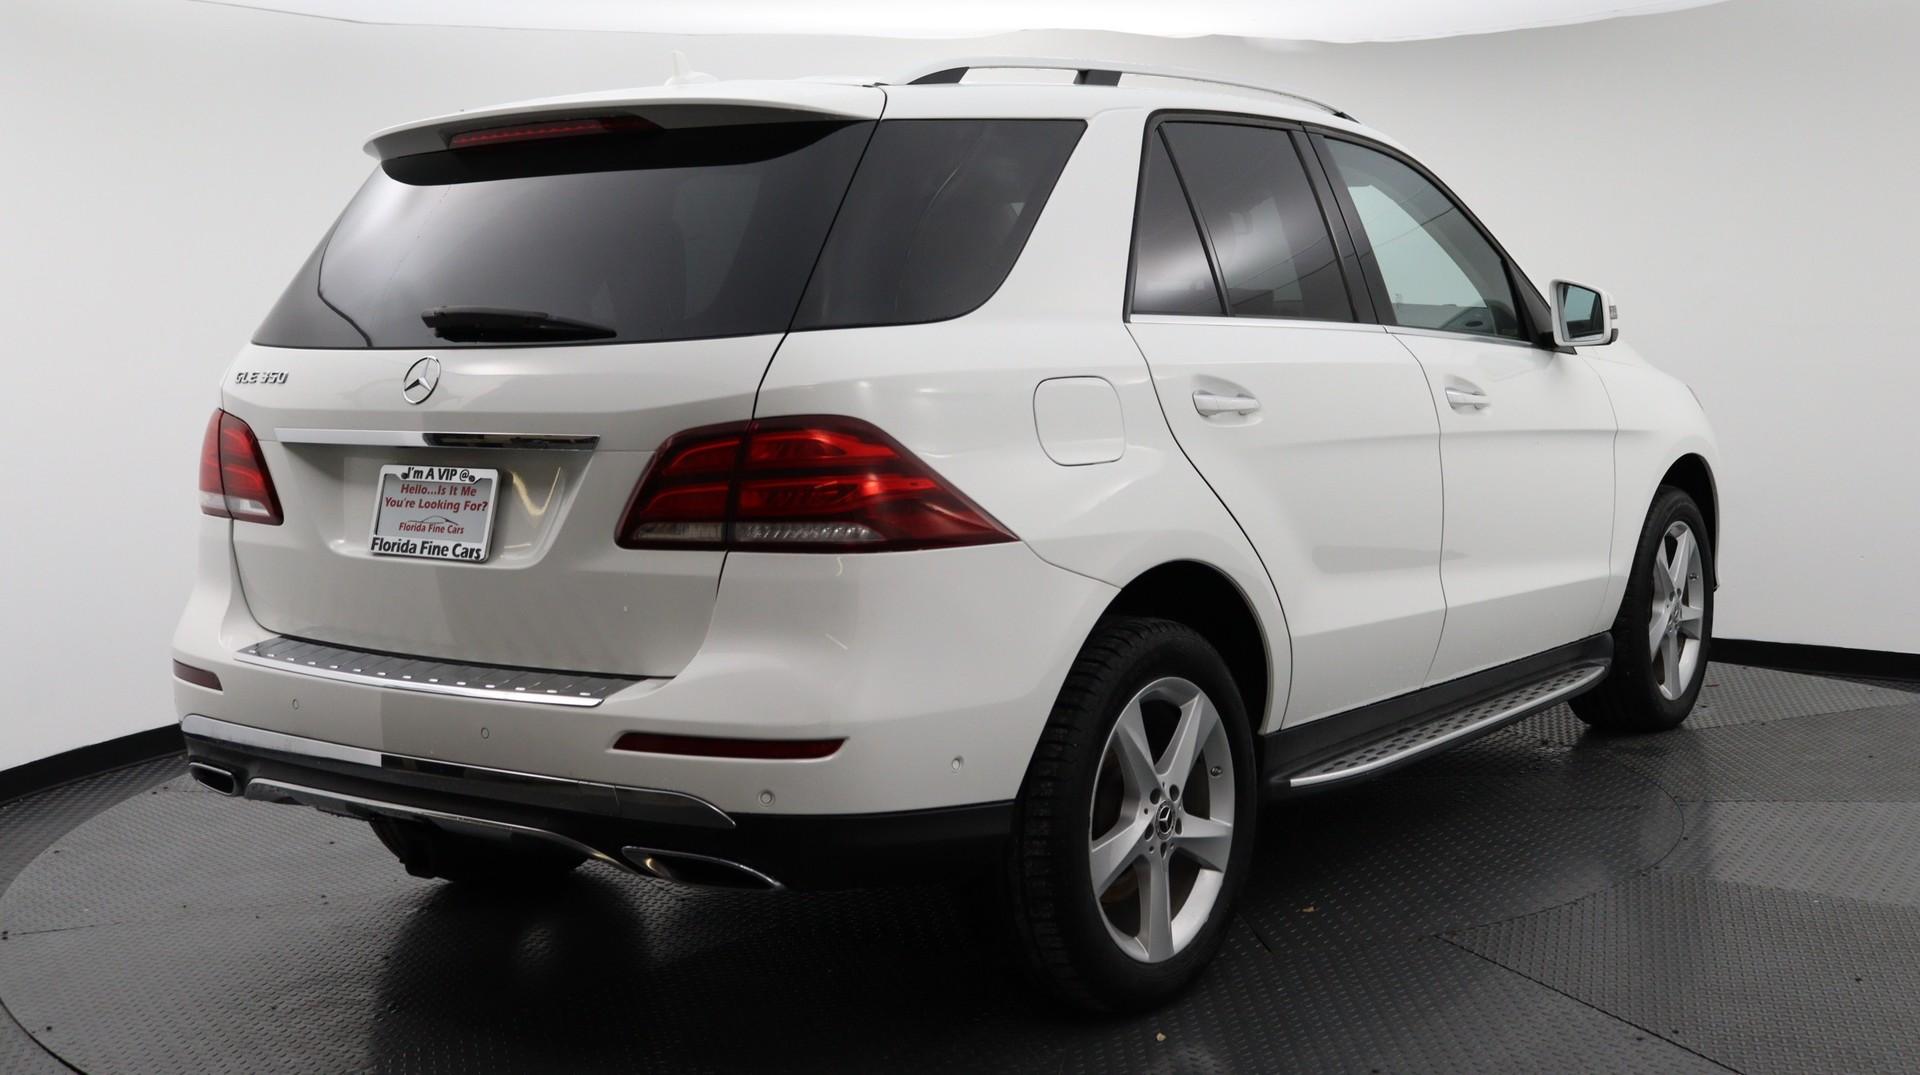 Florida Fine Cars - Used vehicle - SUV MERCEDES-BENZ GLE 2017